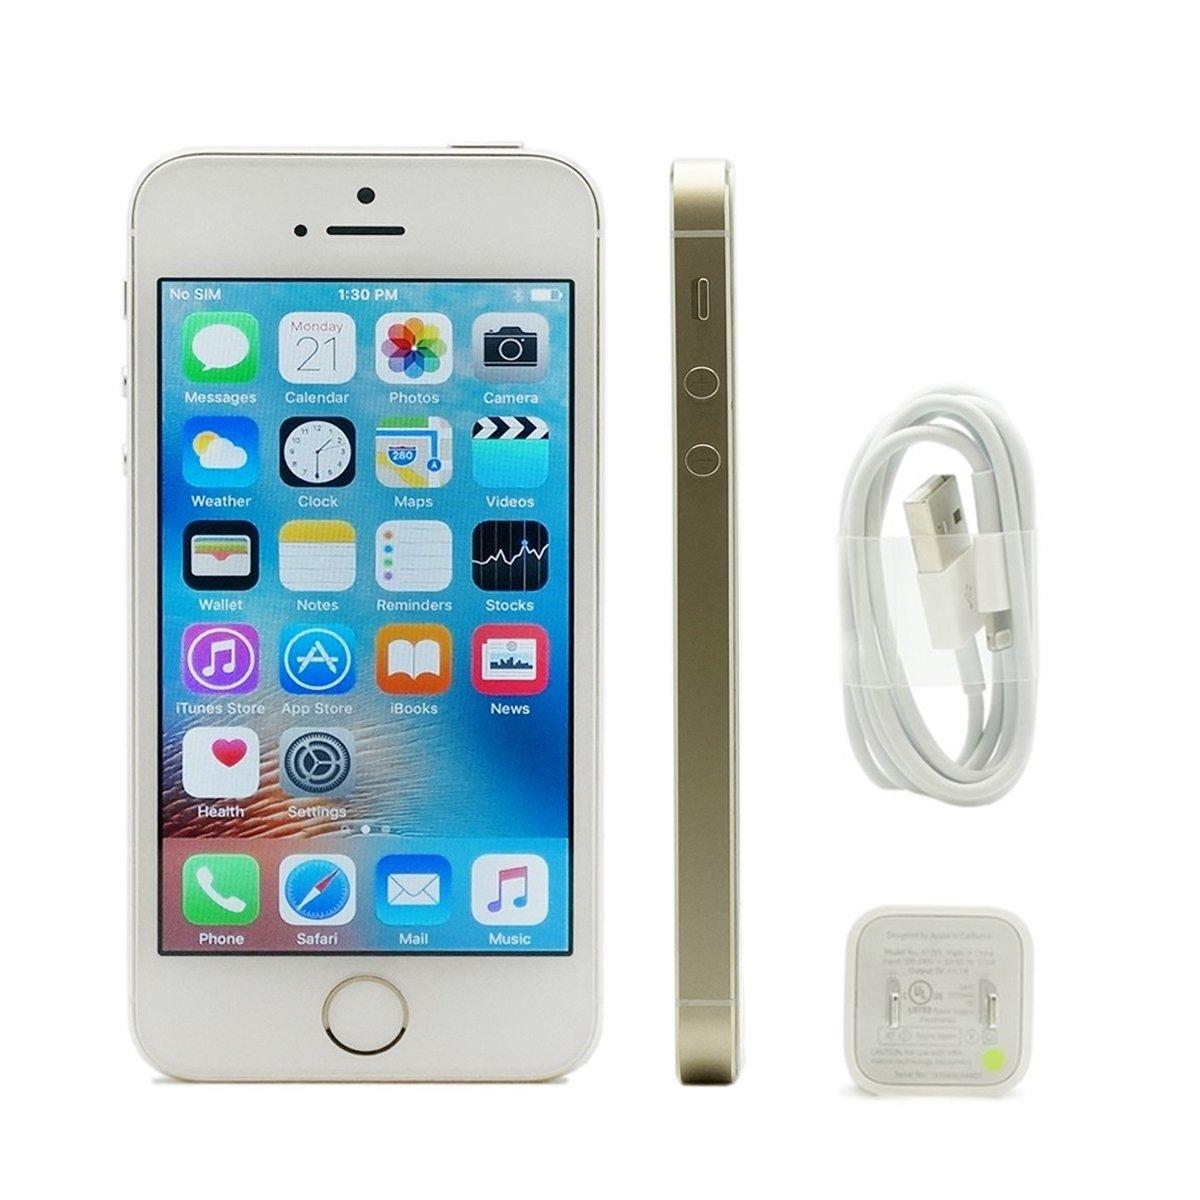 apple iphone 5s 32gb gold unlocked smartphone 5. Black Bedroom Furniture Sets. Home Design Ideas